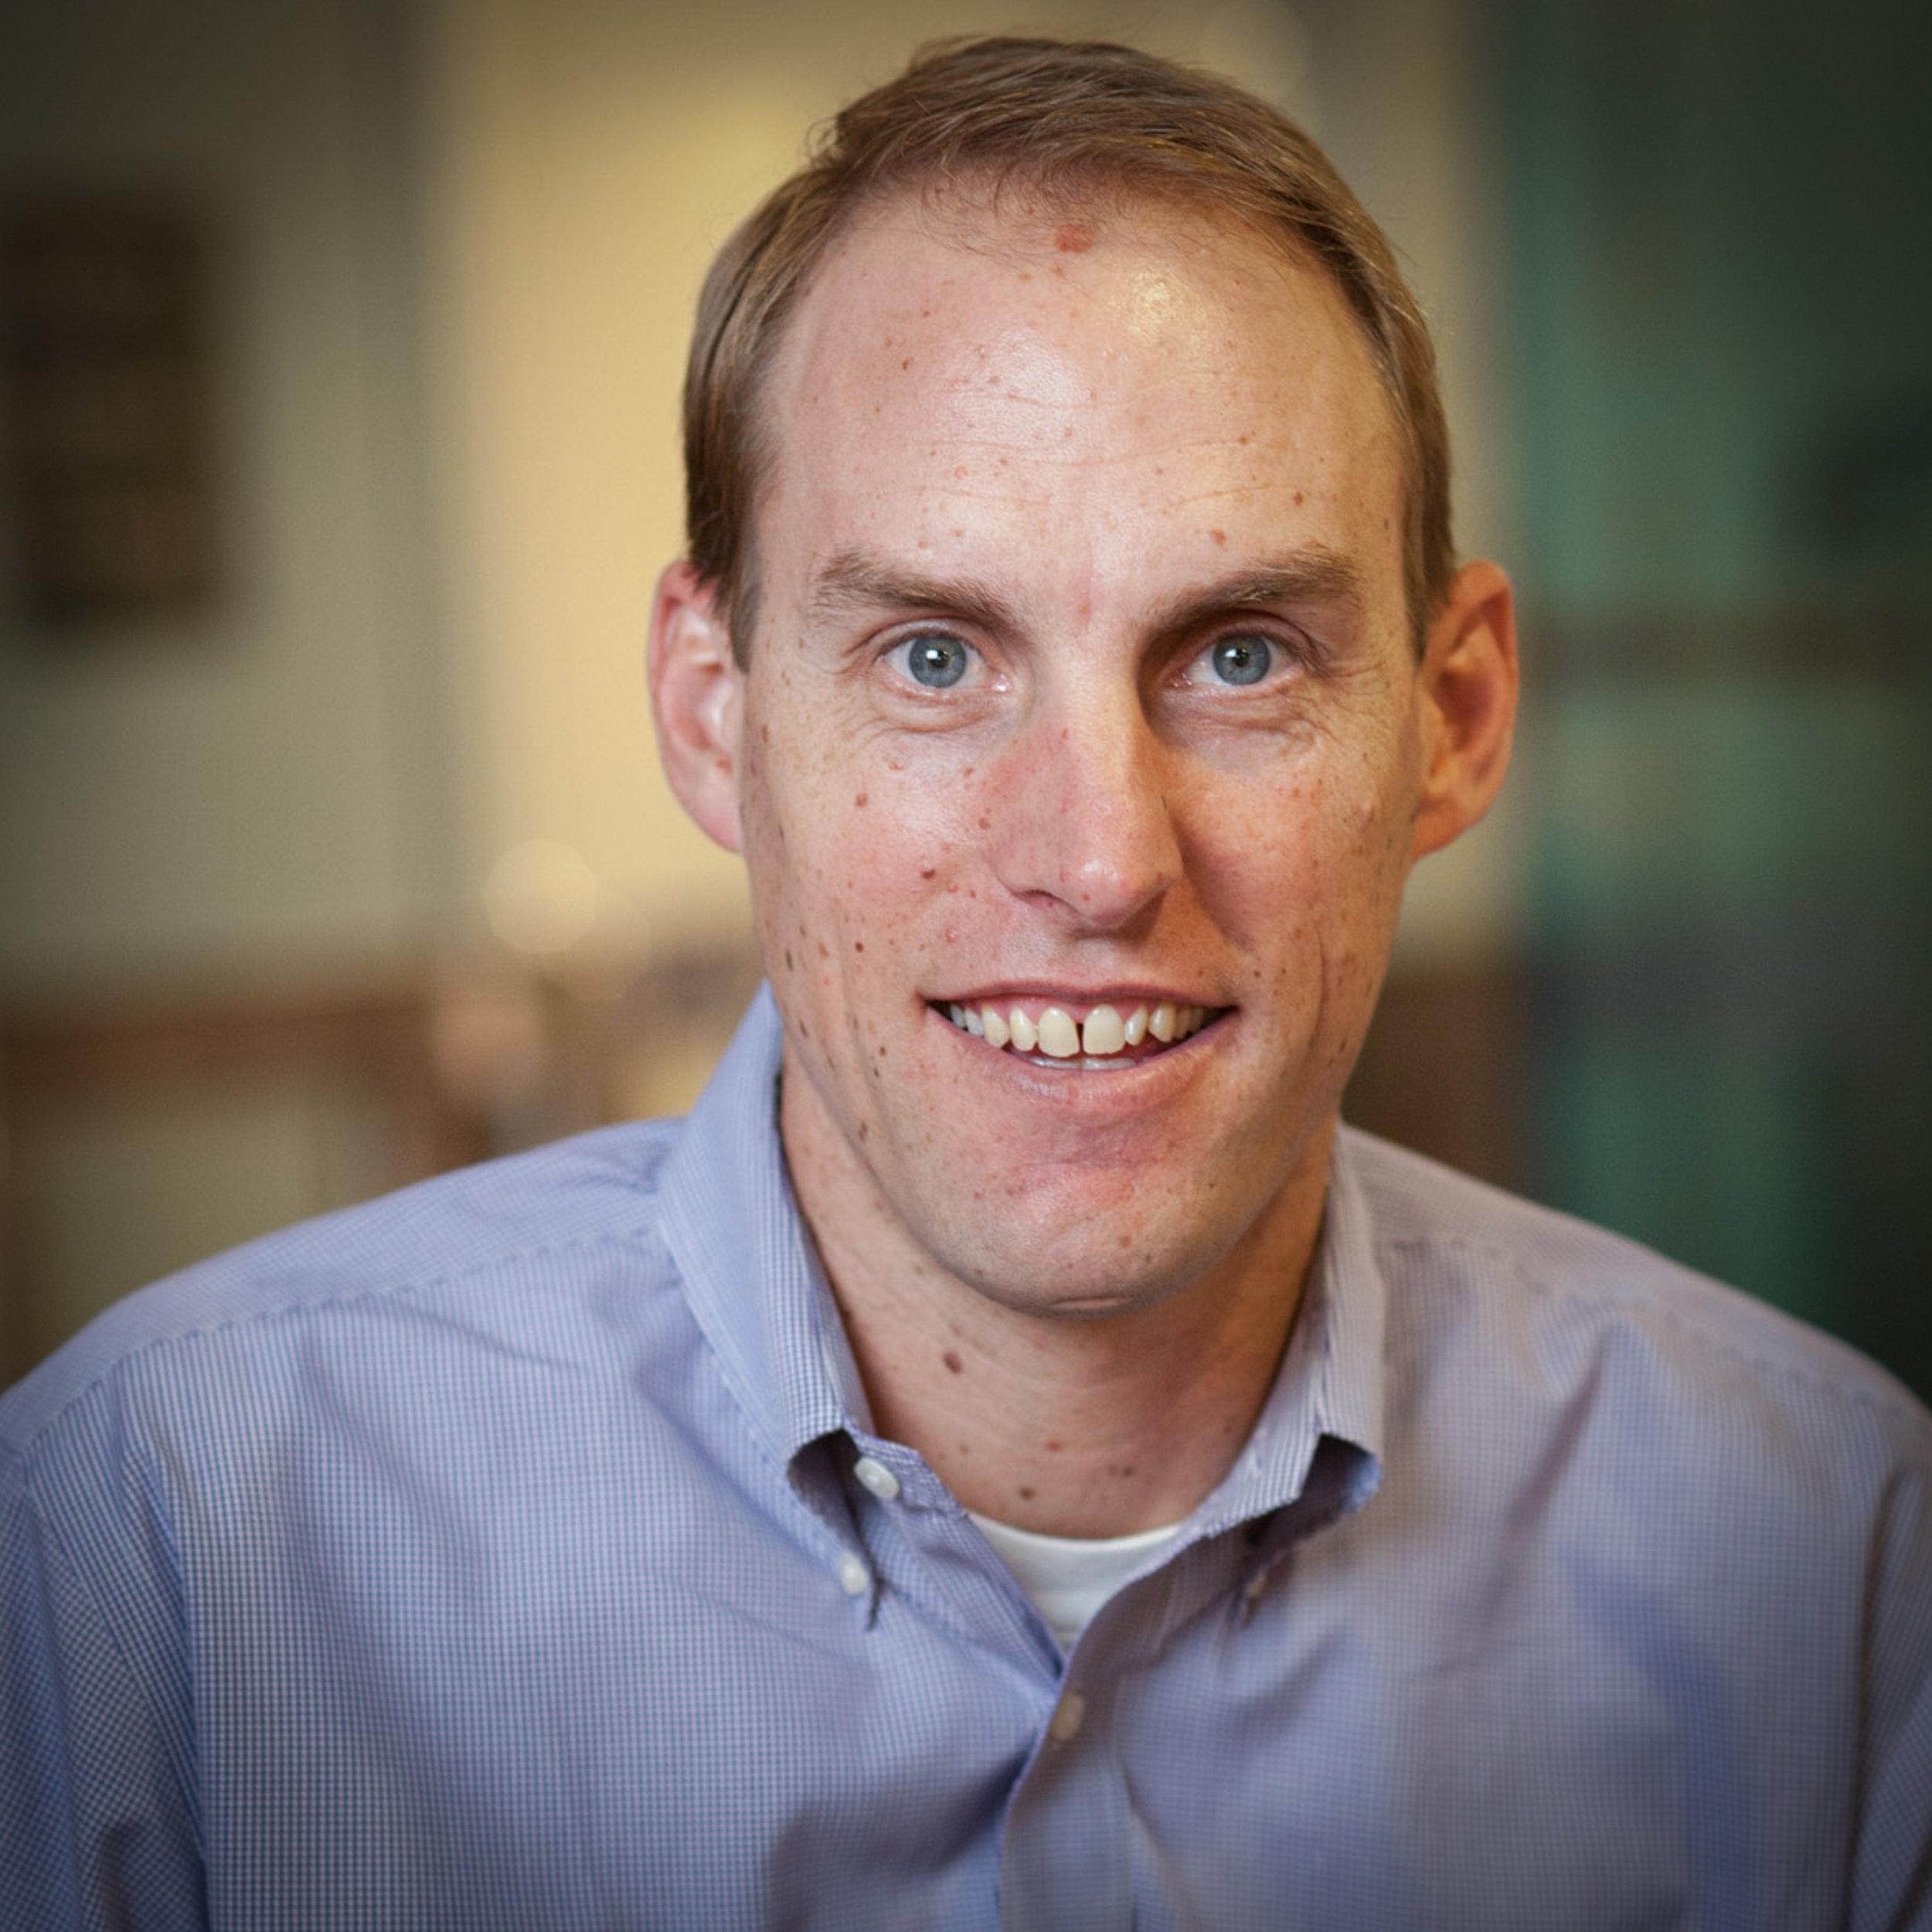 "<a href=""https://www.linkedin.com/in/andykelm"" target=""_blank""><i><b>Andy Kelm</i></b></a><br>Managing Director<br><br><b>Palmarés Advisors</b>"